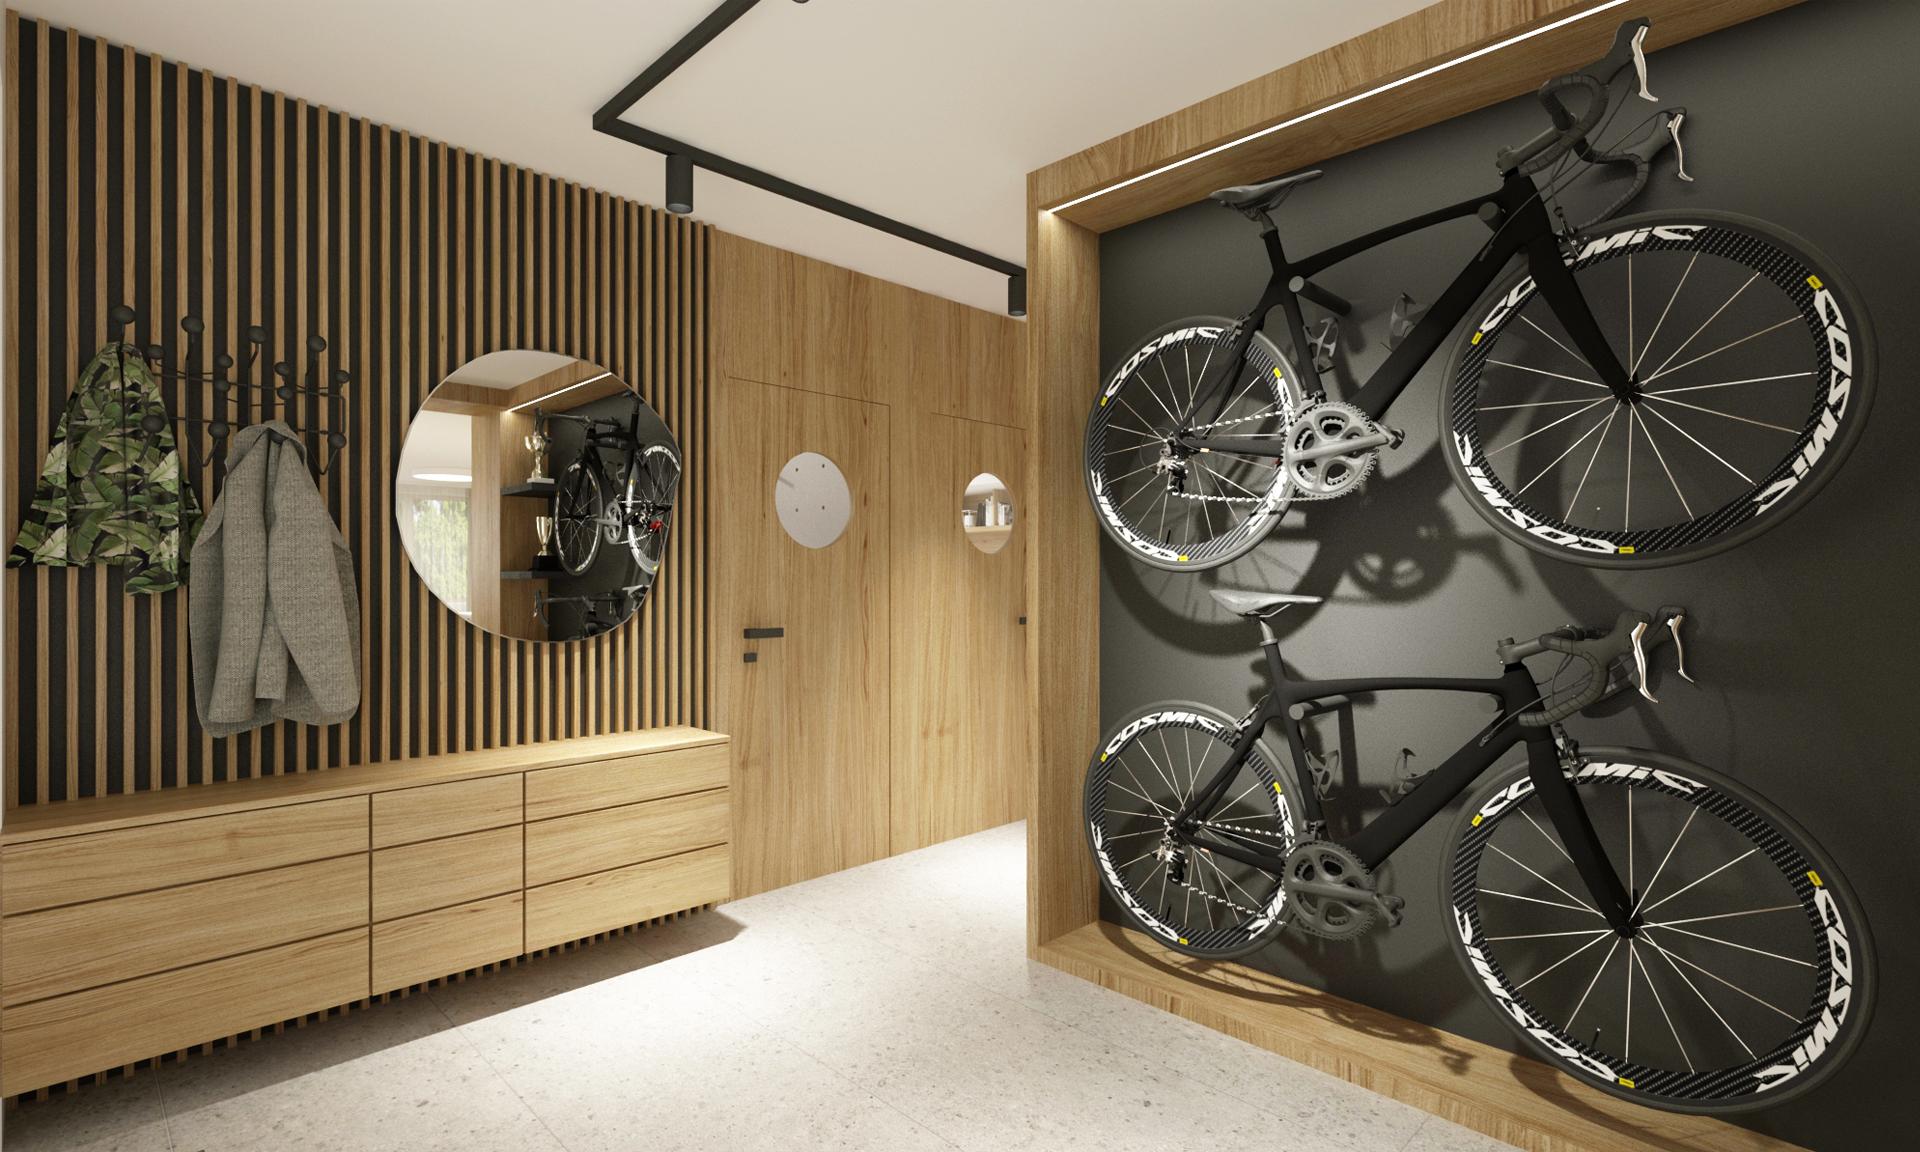 navrh interieru bytu, rekonstrukcia bytu,navrh interieru bratislava, navrh interieru vstupnej chodby, navrh chodby, dizajn chodby, interierovy dizajner, interierovy dizajn, navrh haly, bike interior, sport interior, oak design, oak apartment